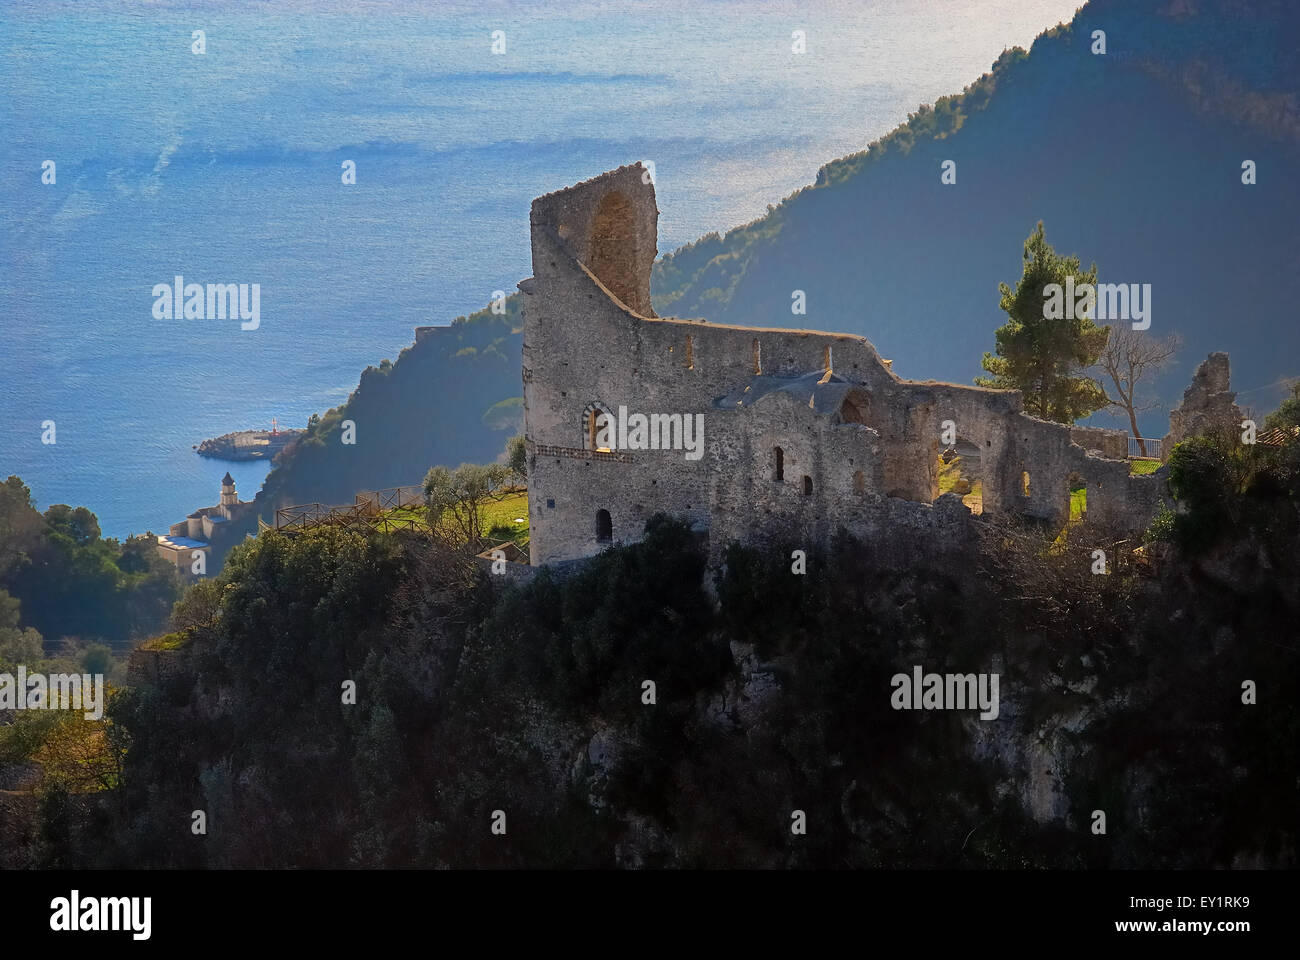 Village of Scala, Costiera Amalfitana, Campania, Italy. Torre dello Ziro (Ziro tower). The Ziro tower is a tower - Stock Image